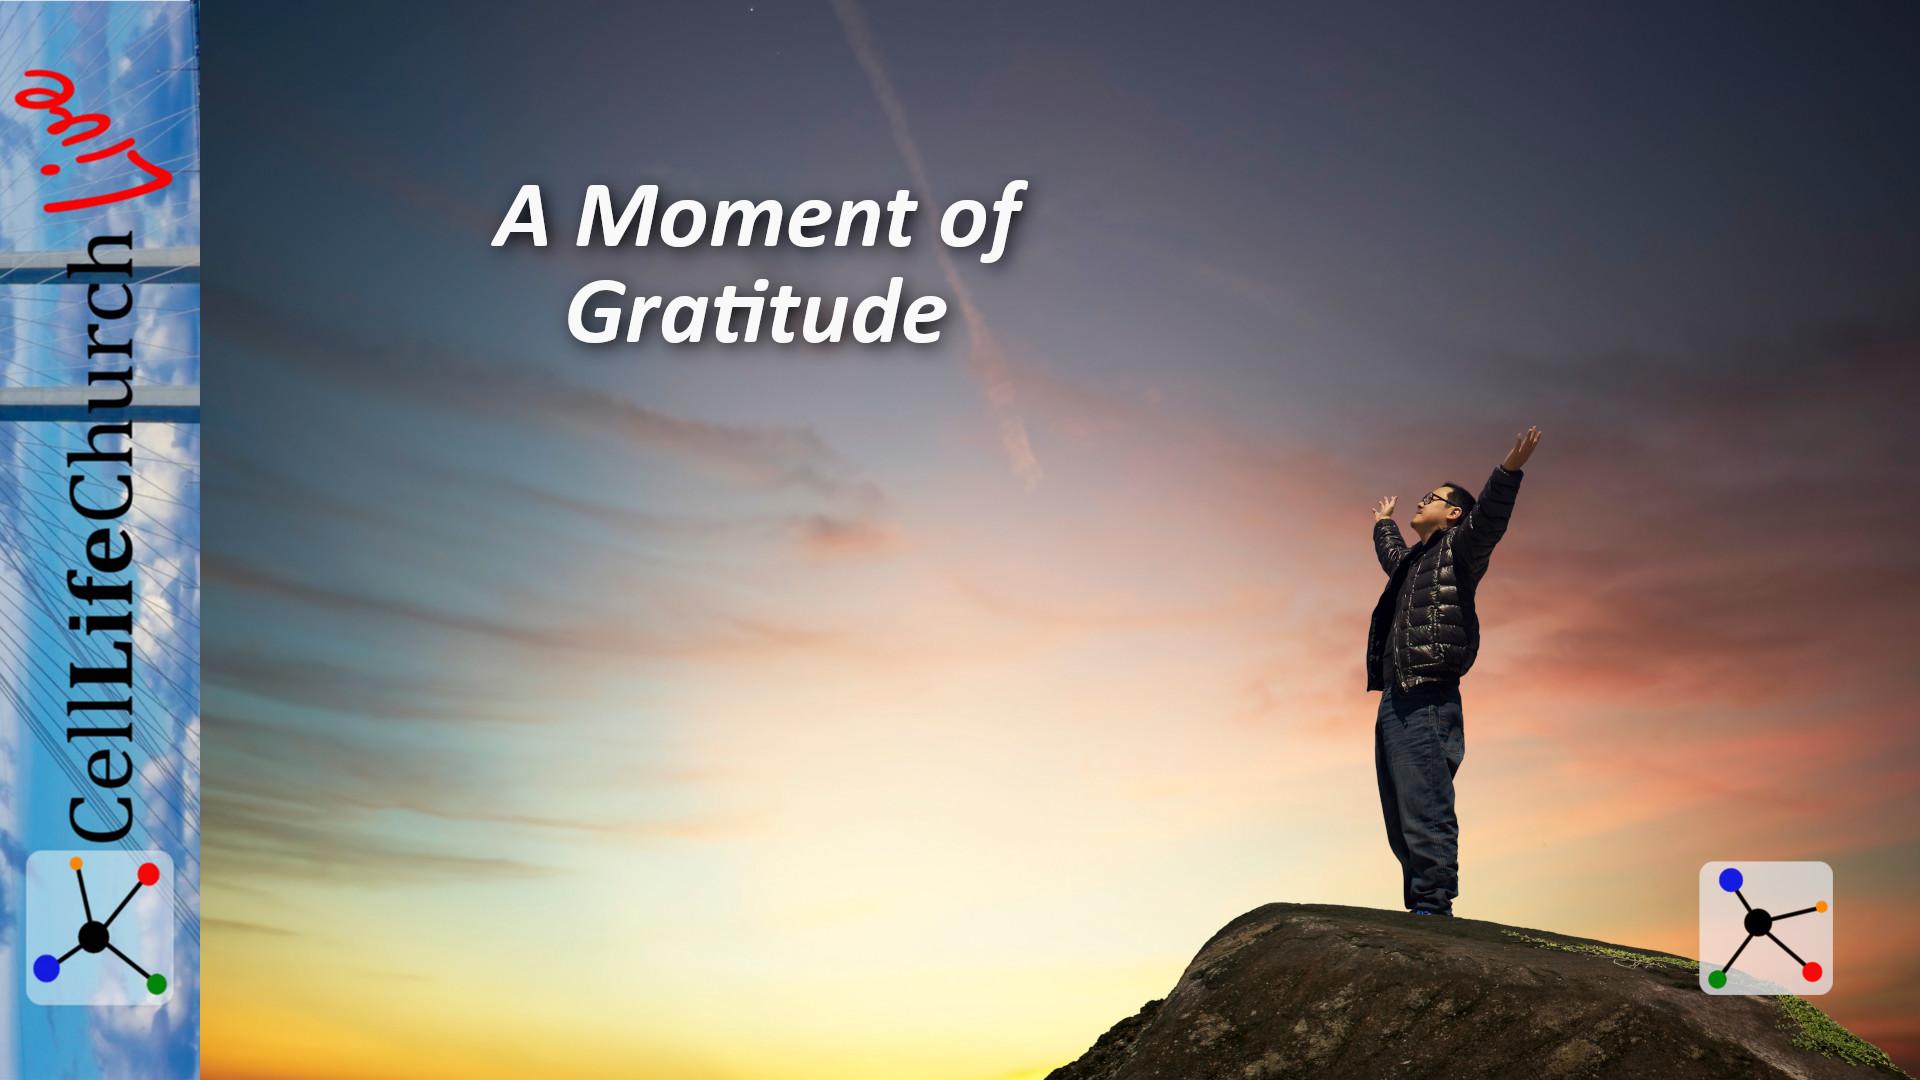 A Moment of Gratitude